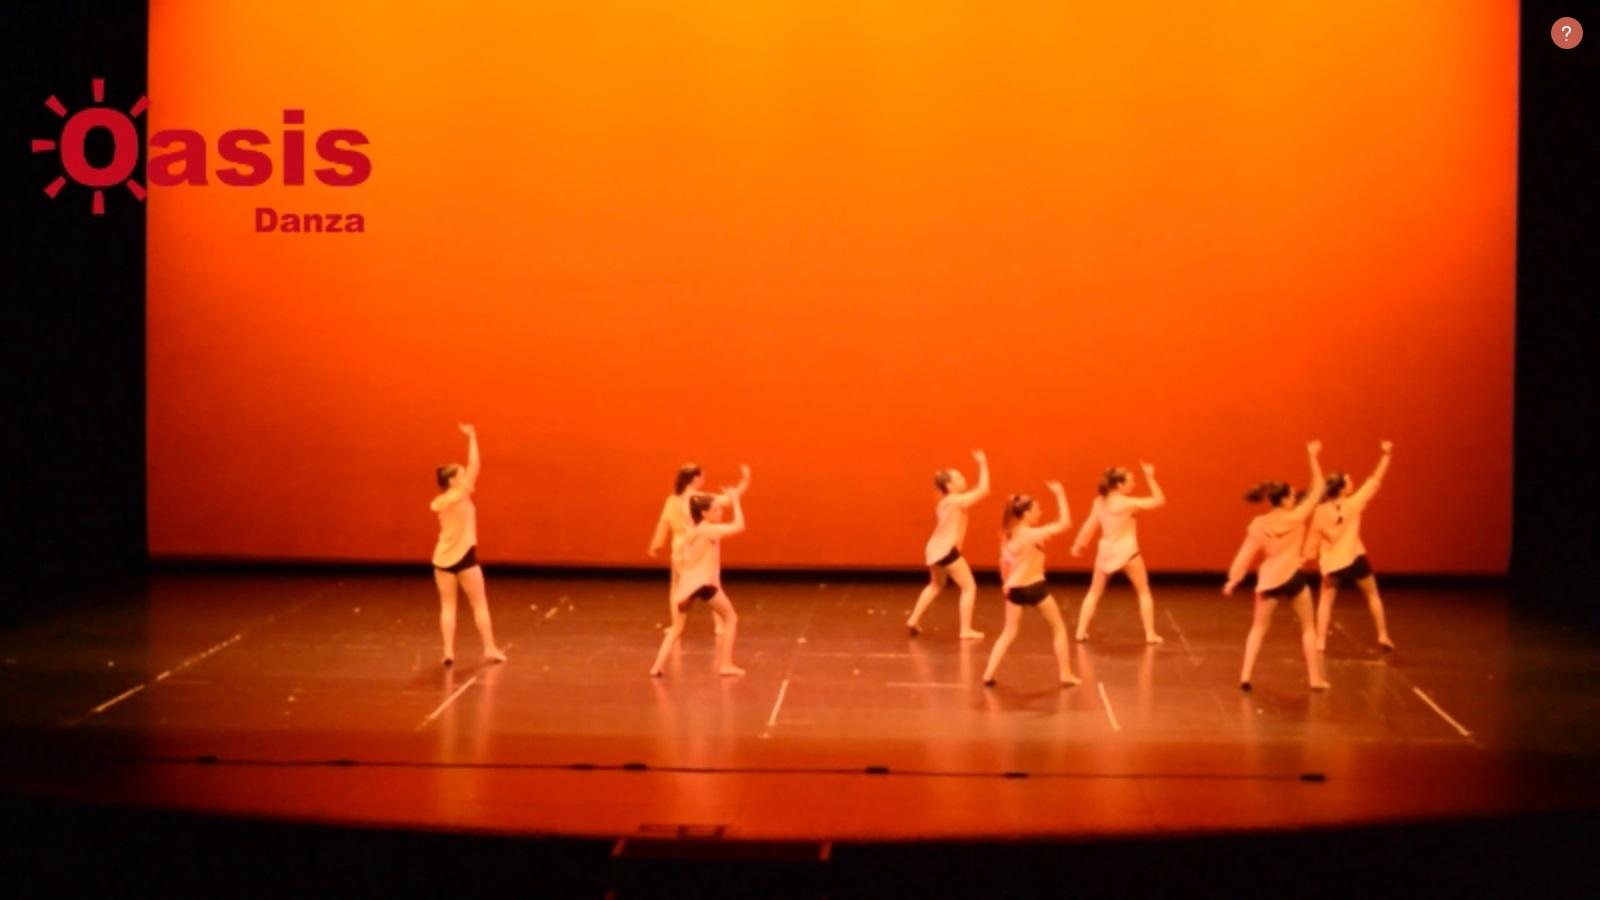 portada del video danza contefusion vuelve